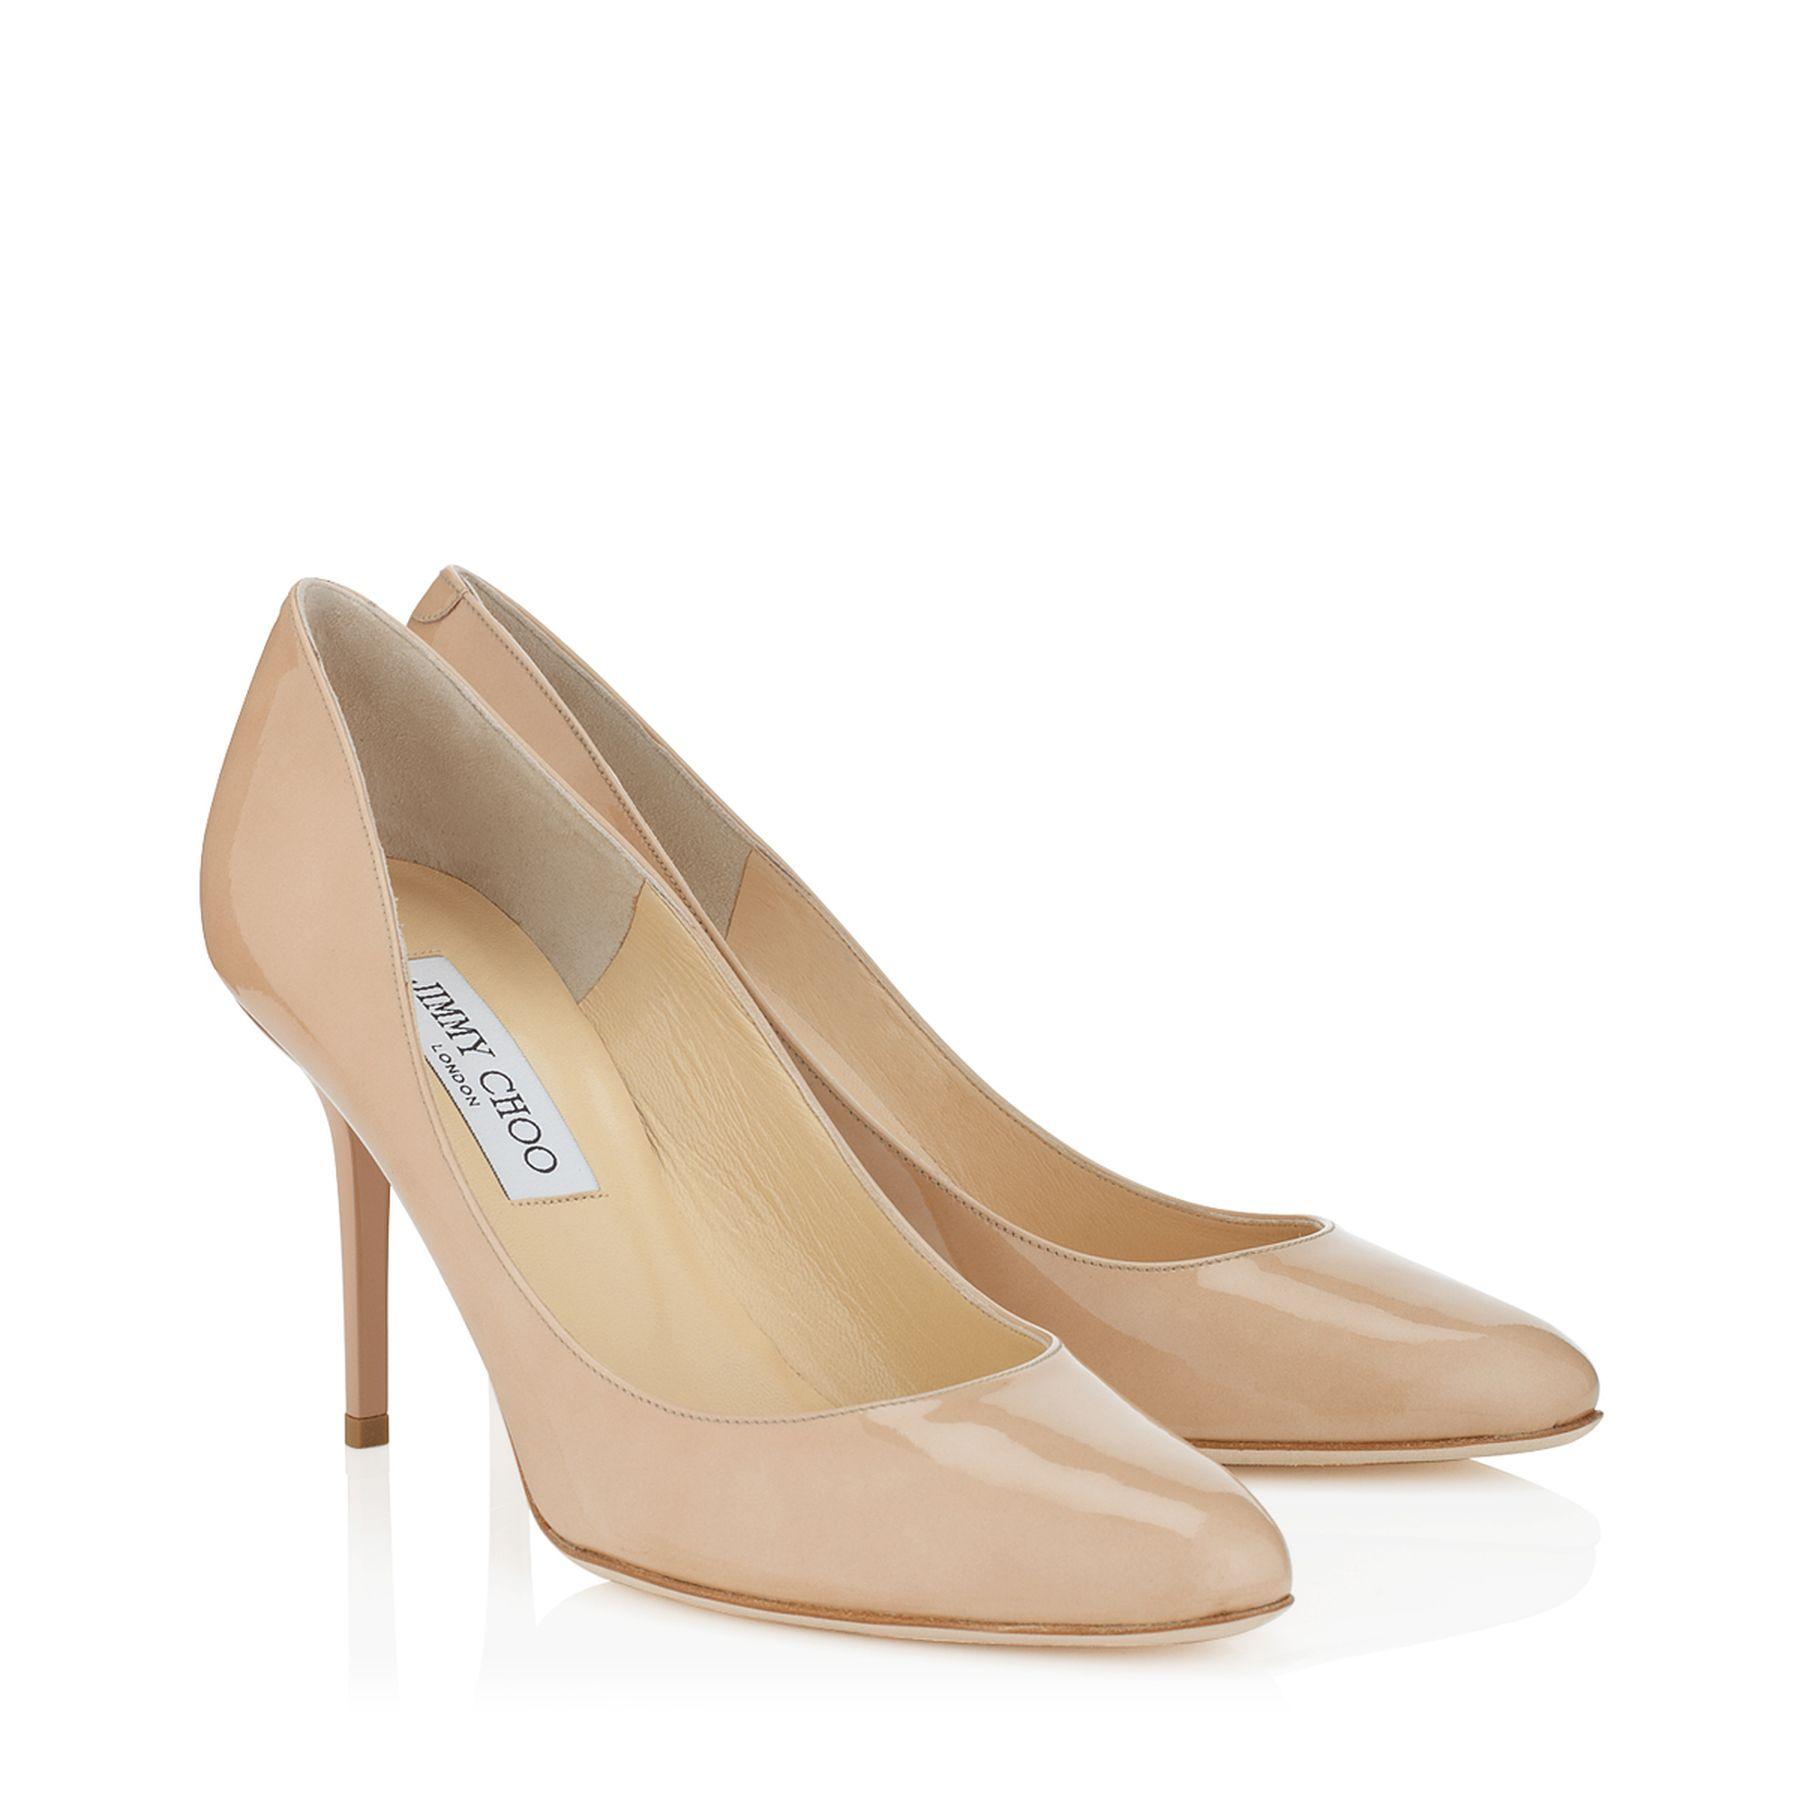 elegant nude patent leather round toe pumps gilbert jimmy choo rh pinterest co uk